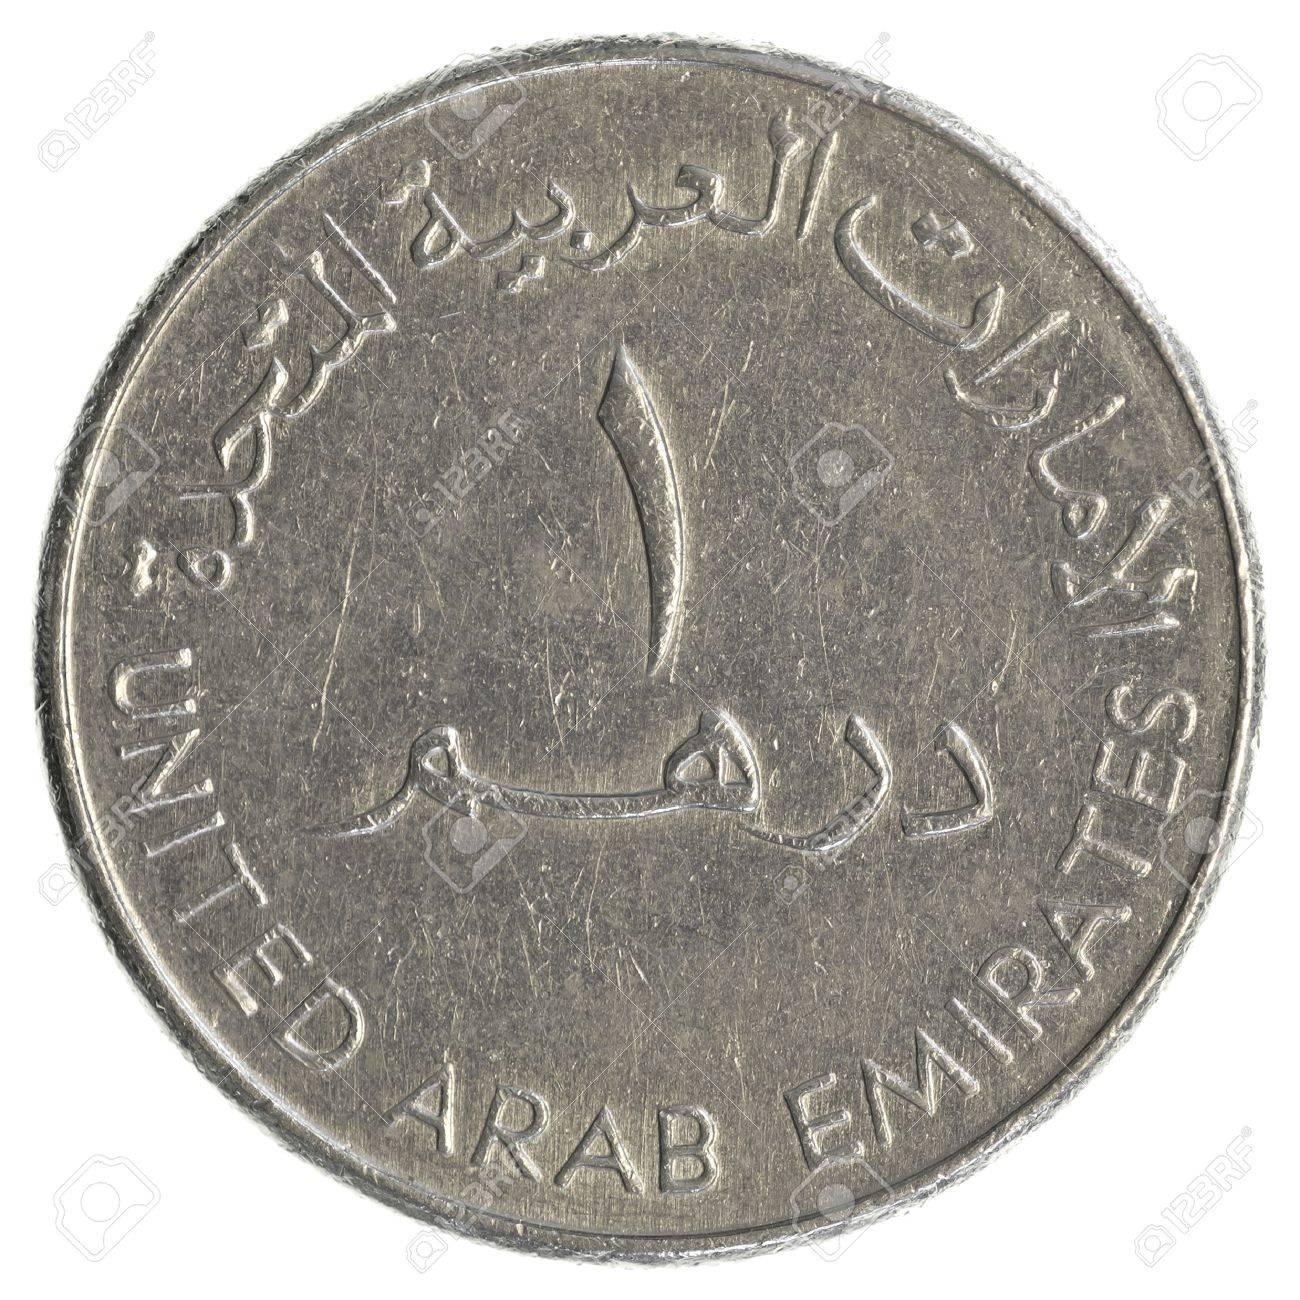 One united arab emirates dirham coin isolated on white background one united arab emirates dirham coin isolated on white background stock photo 20549936 biocorpaavc